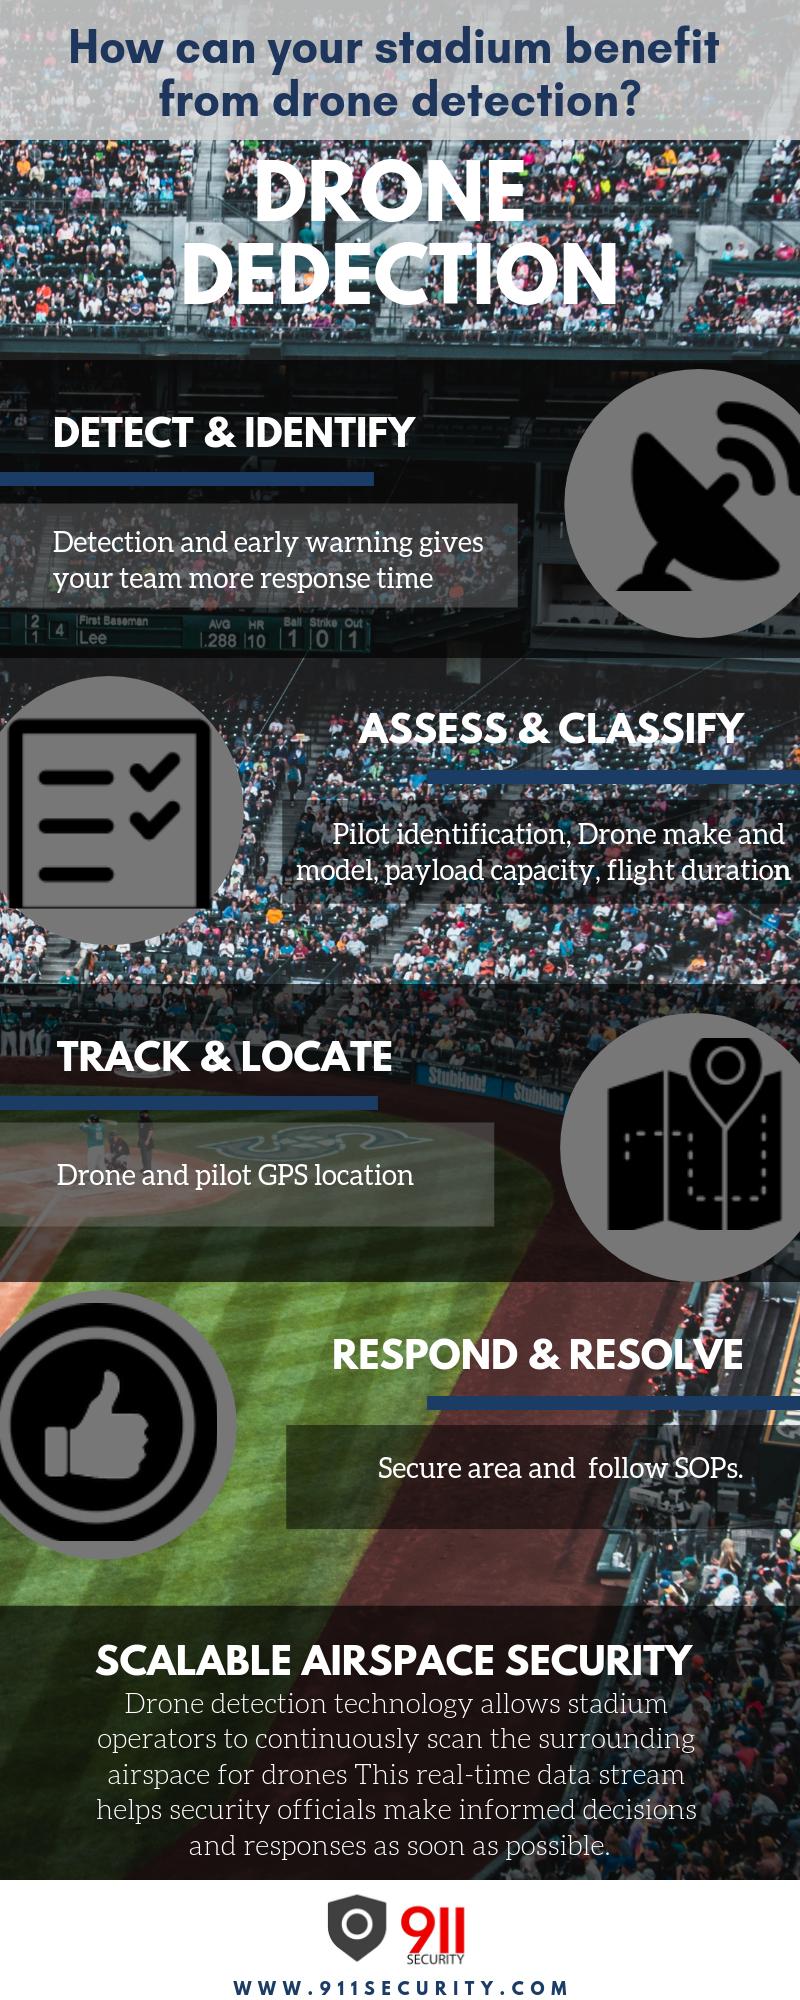 Stadium Security Drone Detection Benefits Infographic